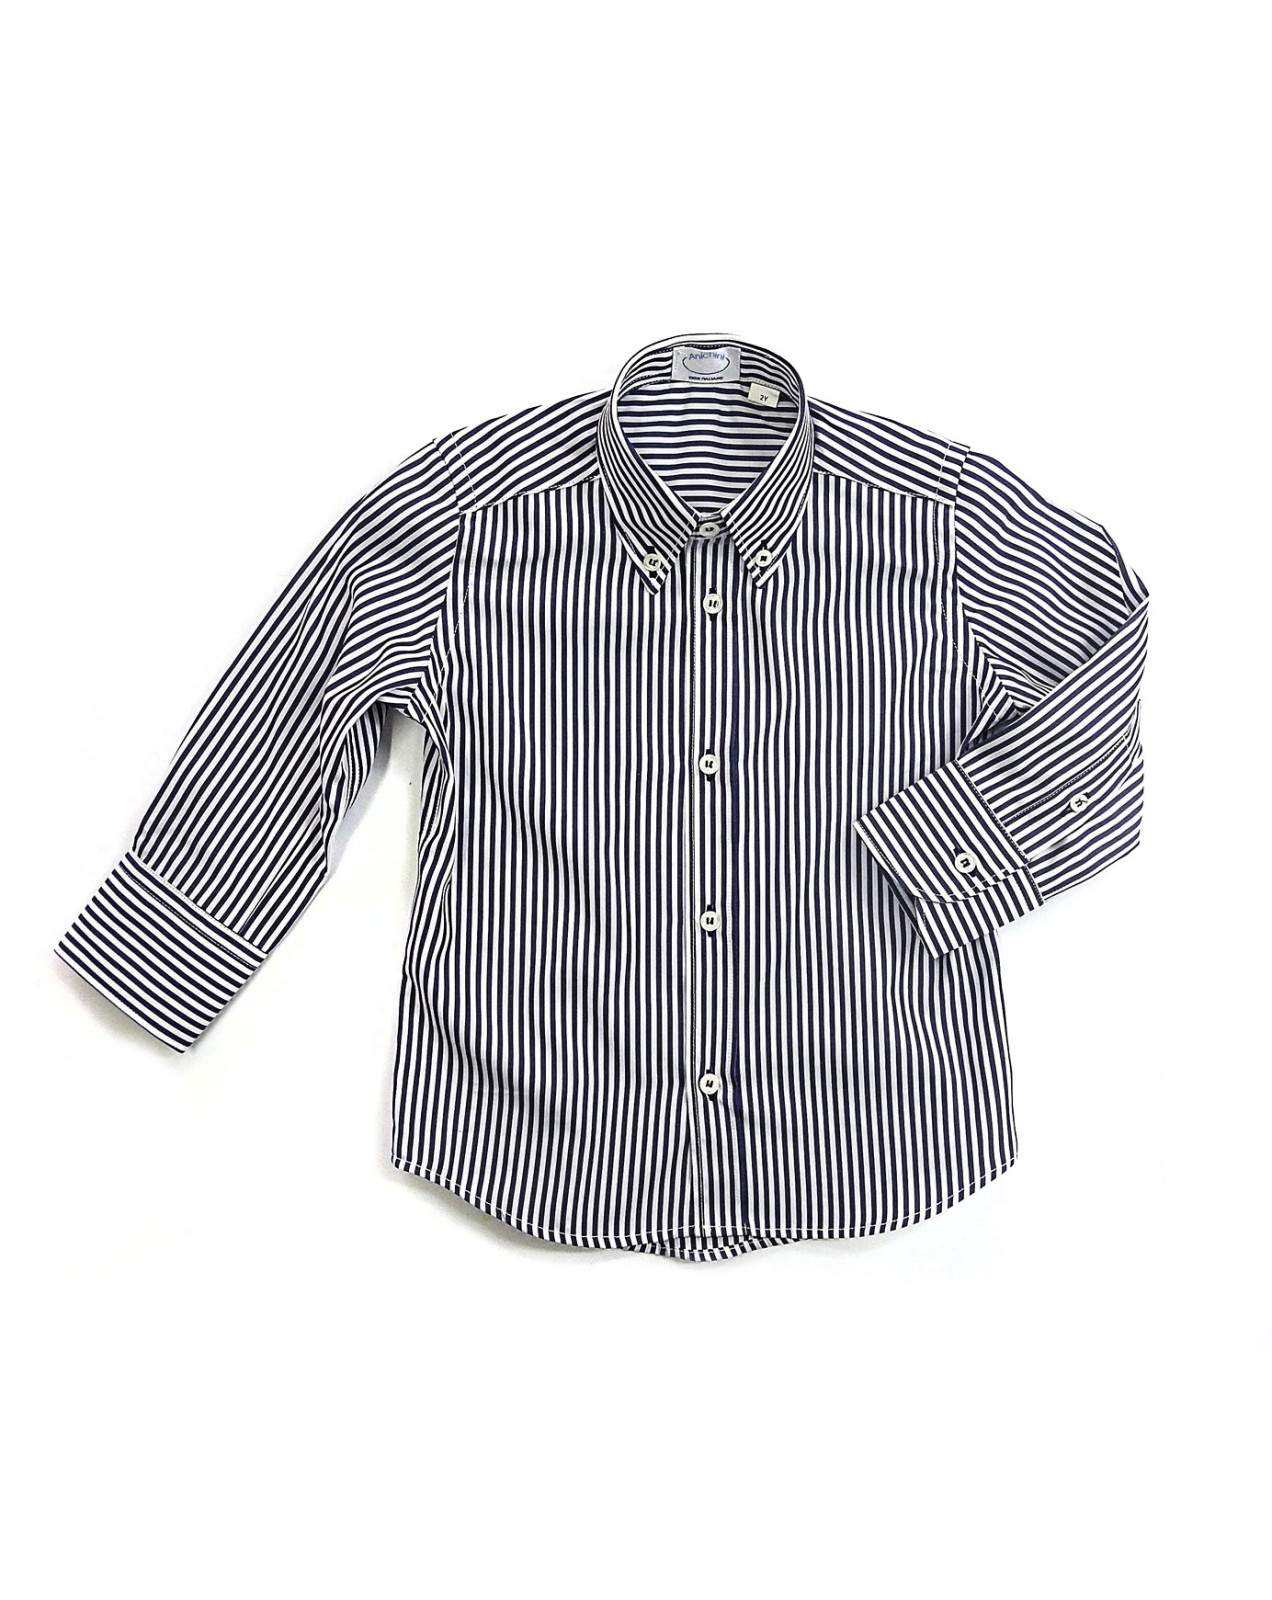 Boy tailored button down shirt Ascanio